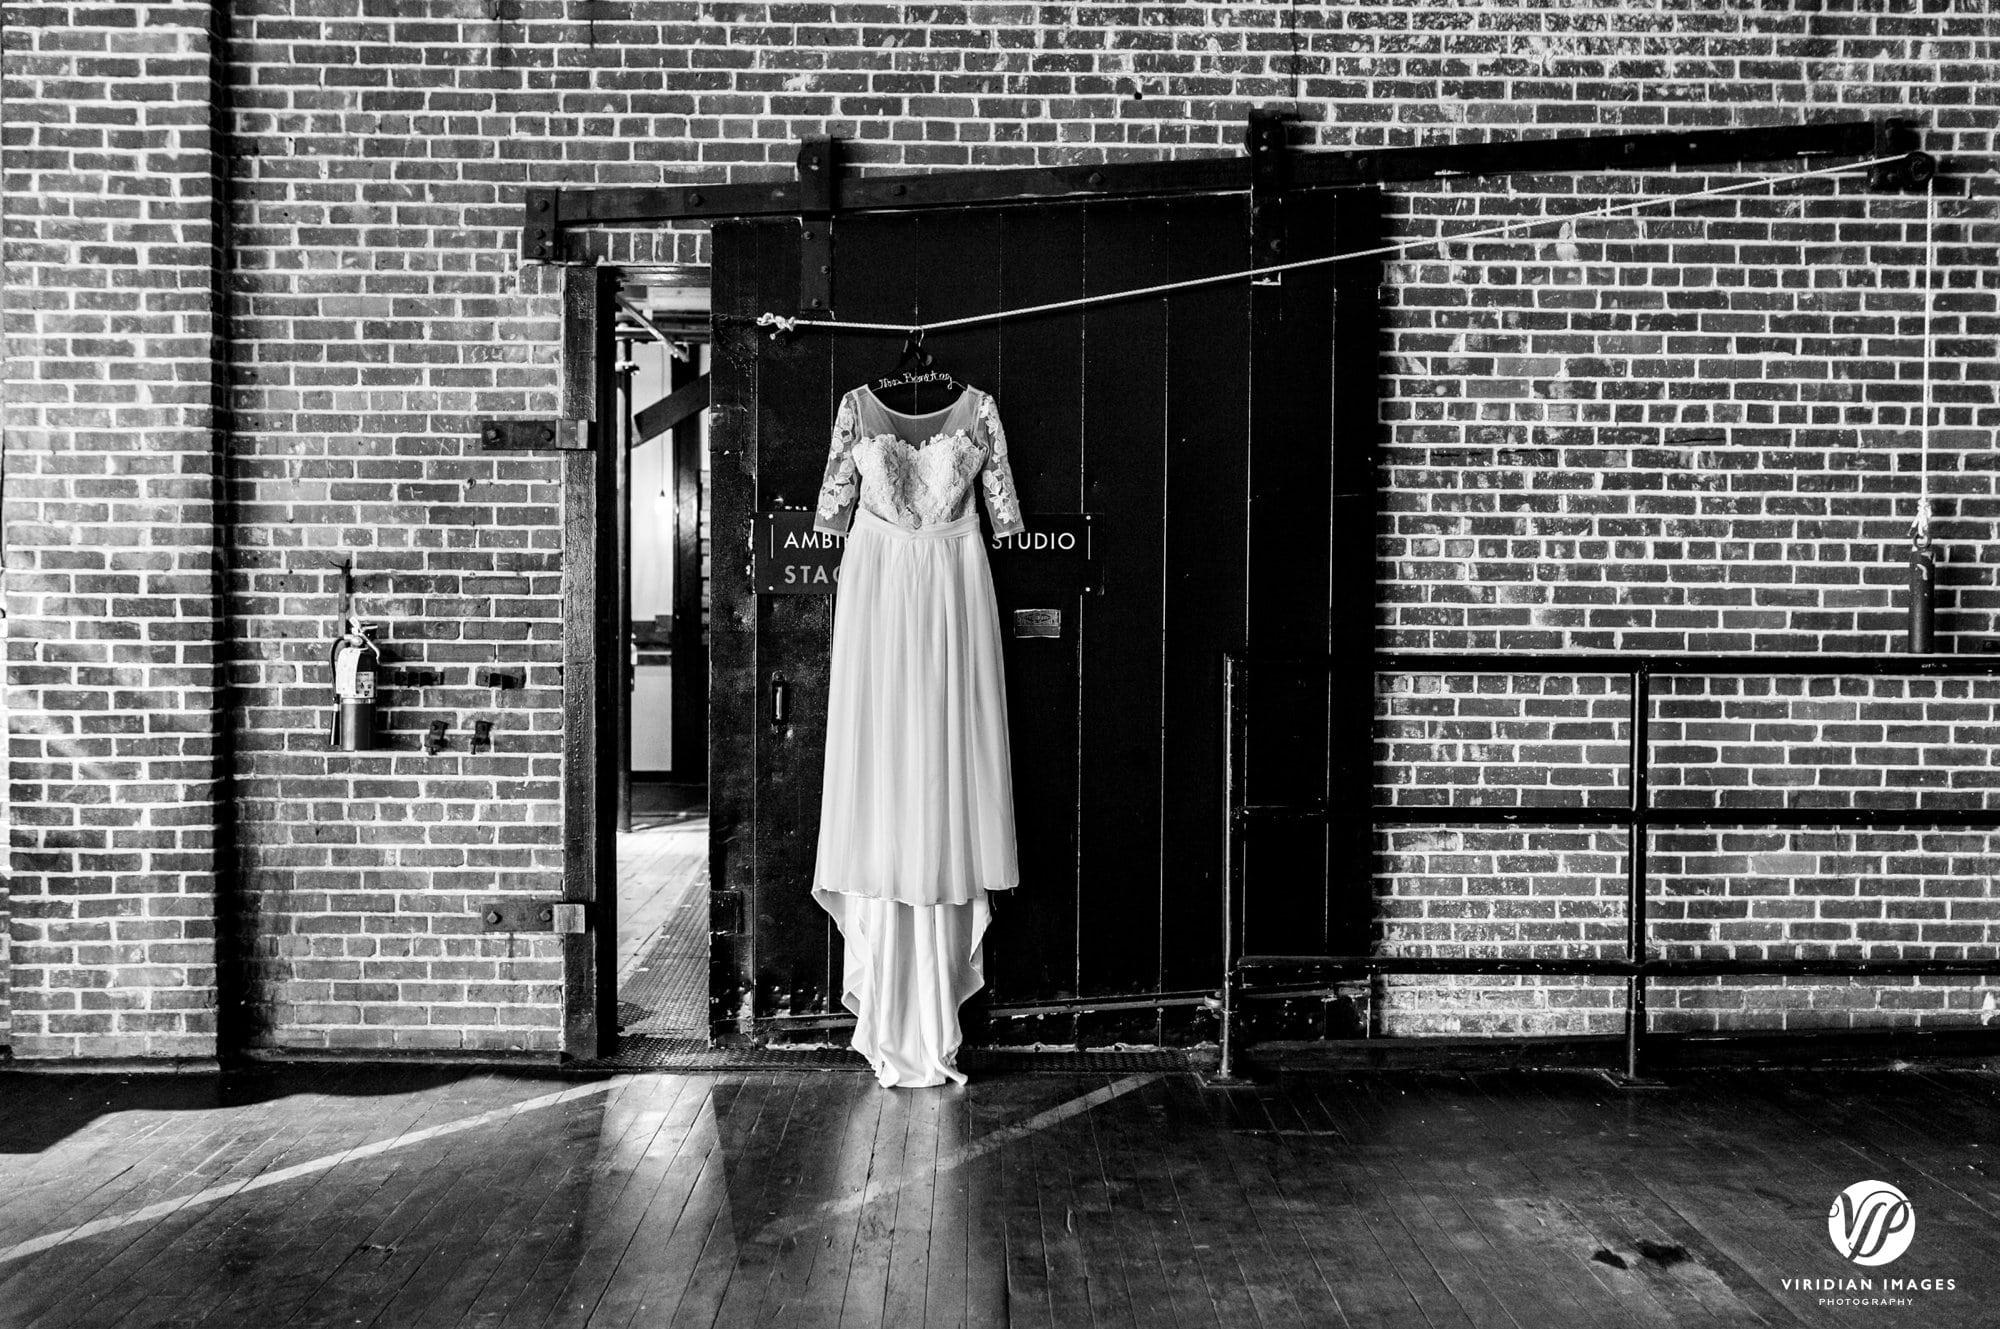 Ambient+Studio wedding dress